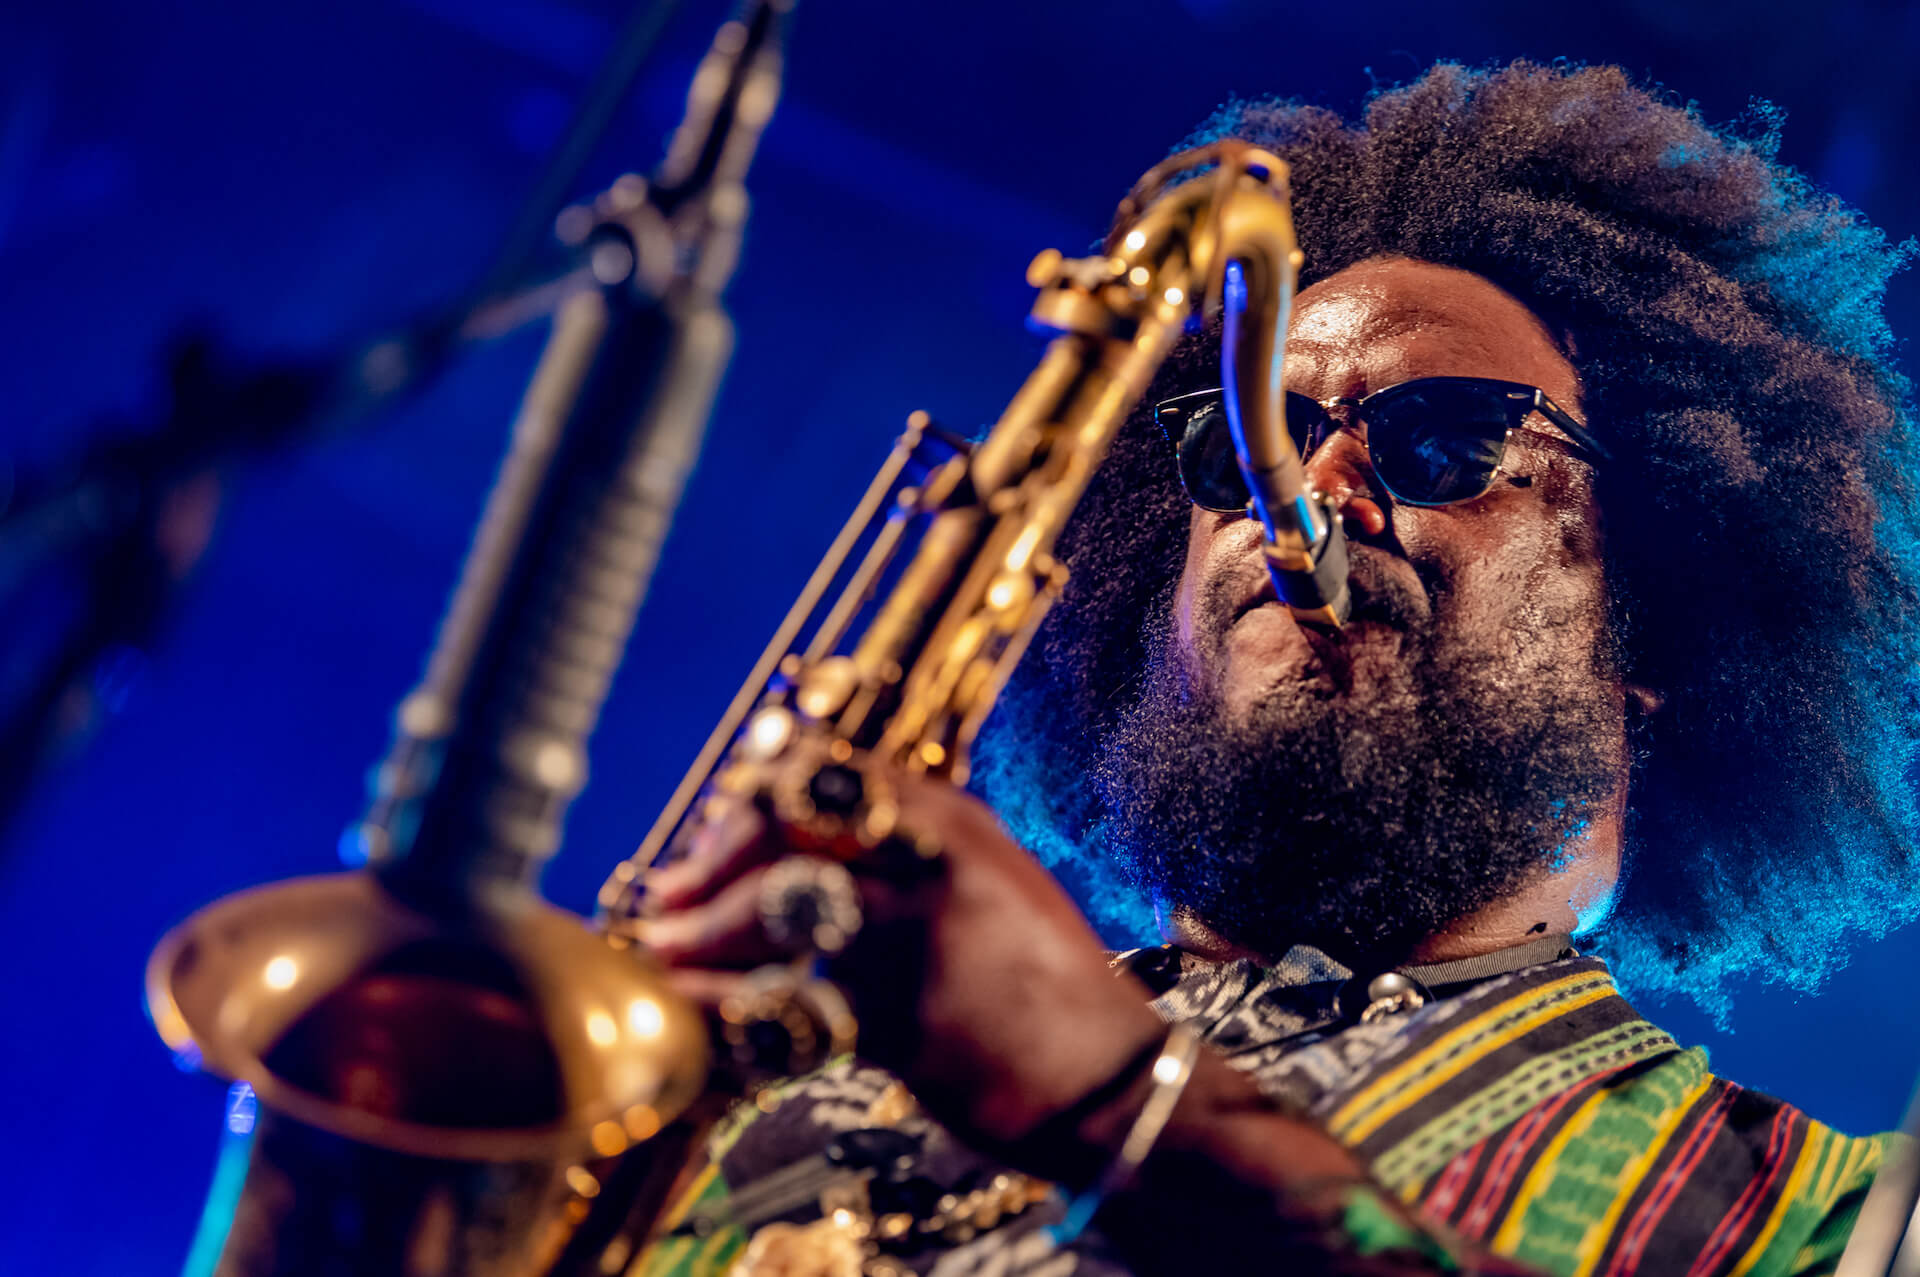 Kamasi Washington ライブレポート|「ブラック・エンターテインメント」の伝統を今に受け継ぐ見事なショウ music190903-kamasiwashington-2